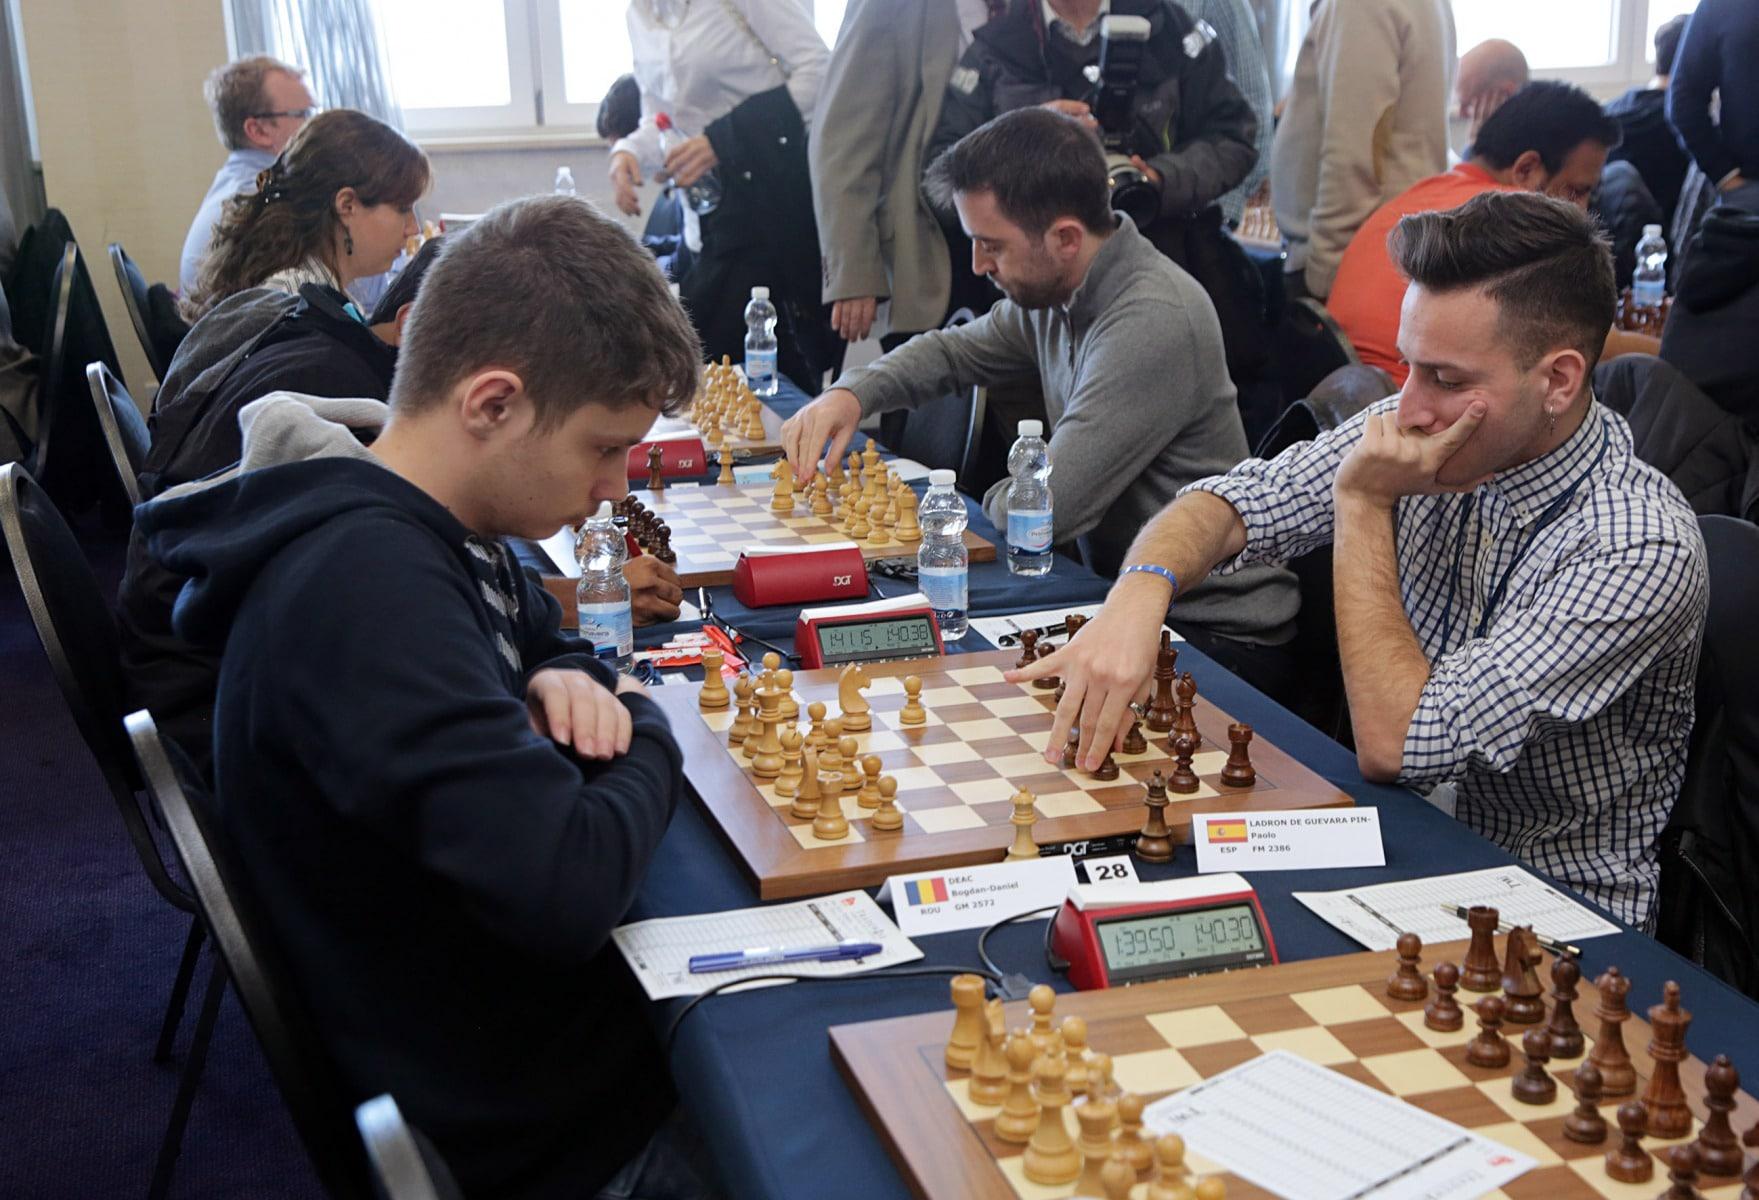 27-ene-17-fabin-picardo-visita-el-open-de-gibraltar-de-ajedrez-14_32513494886_o